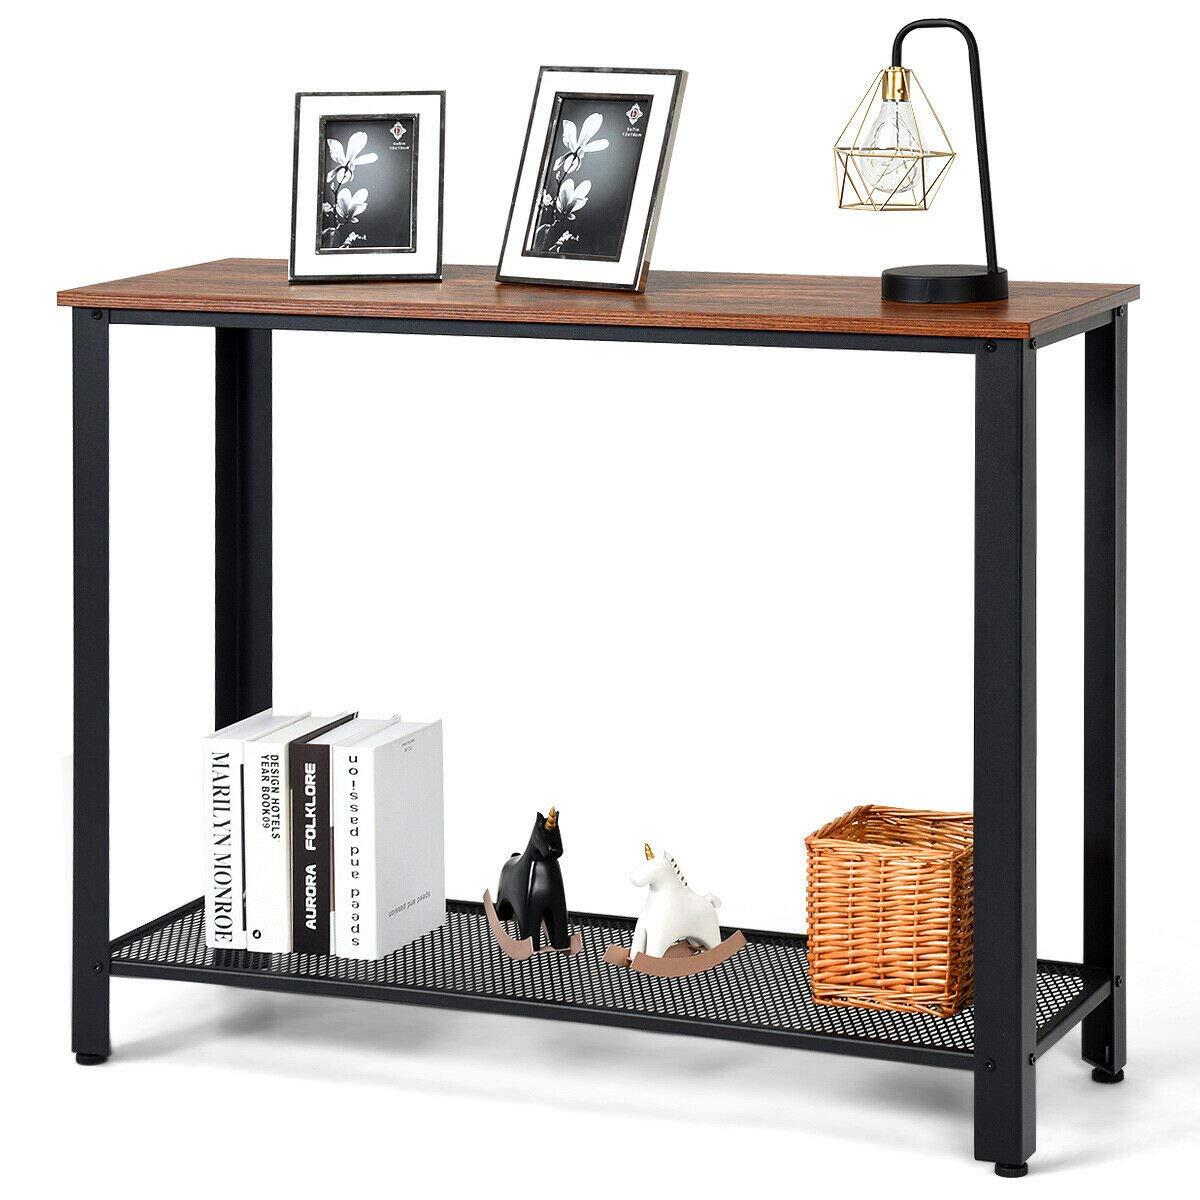 Amazon.com: Black Console Sofa Table Coffee Table W/Storage ...